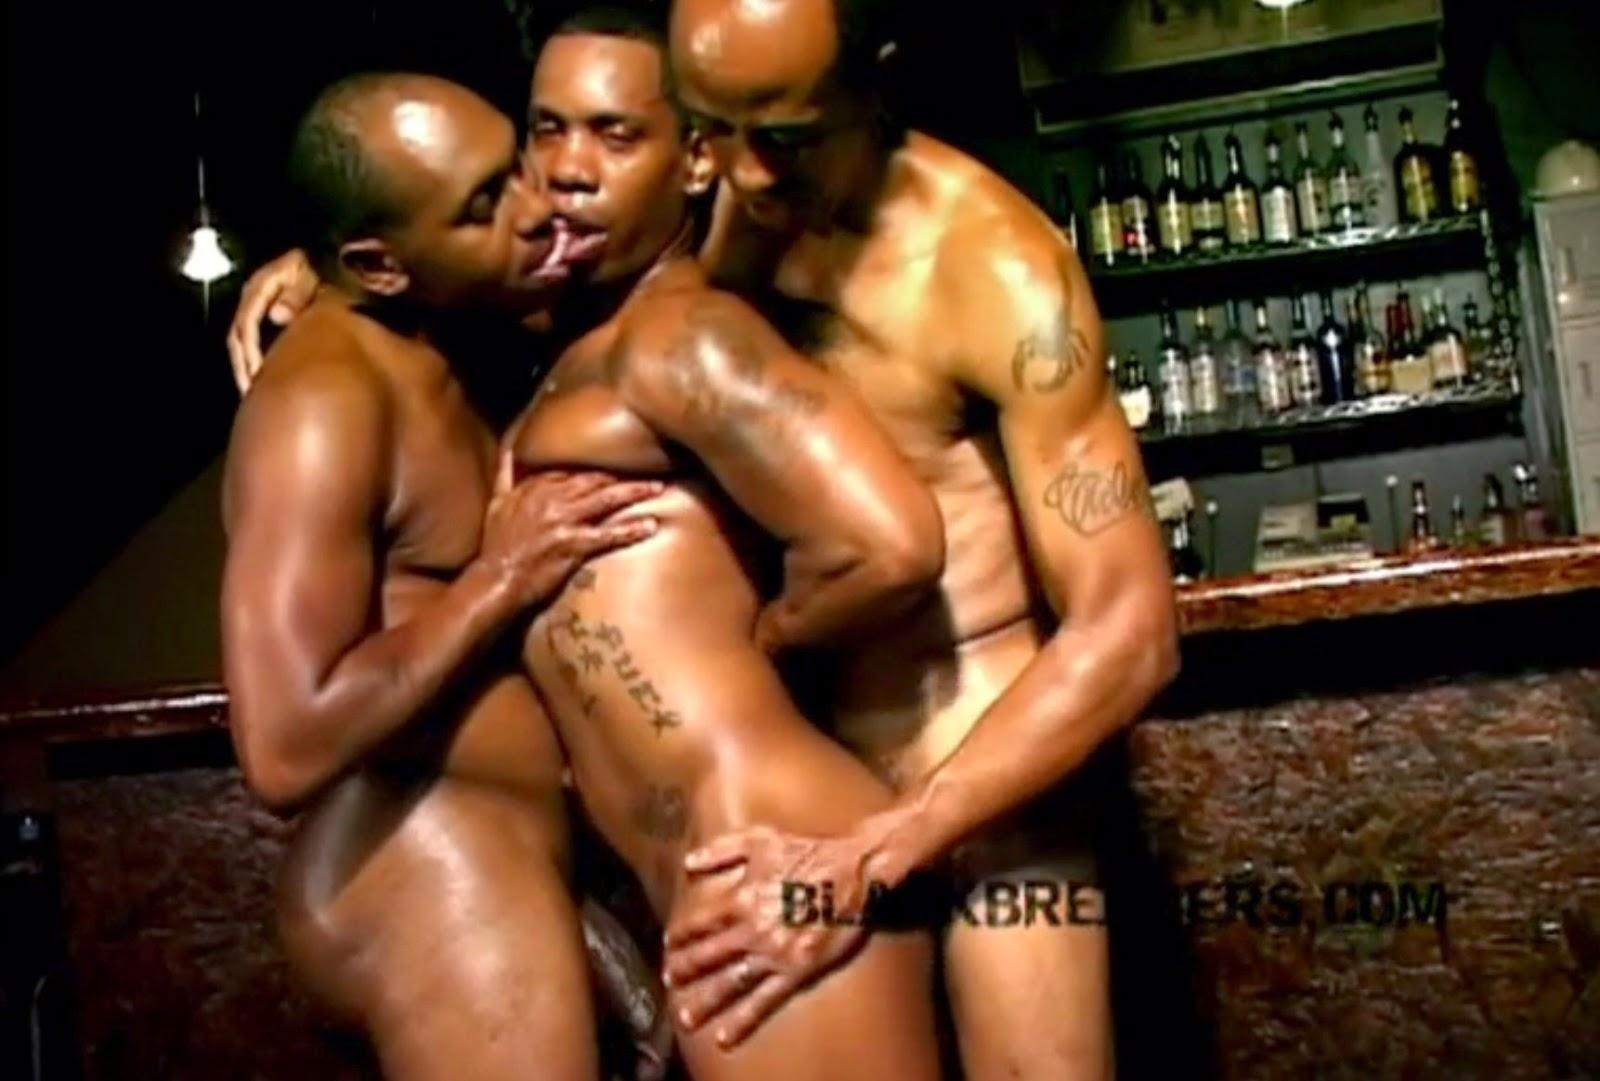 sexual copulation photos